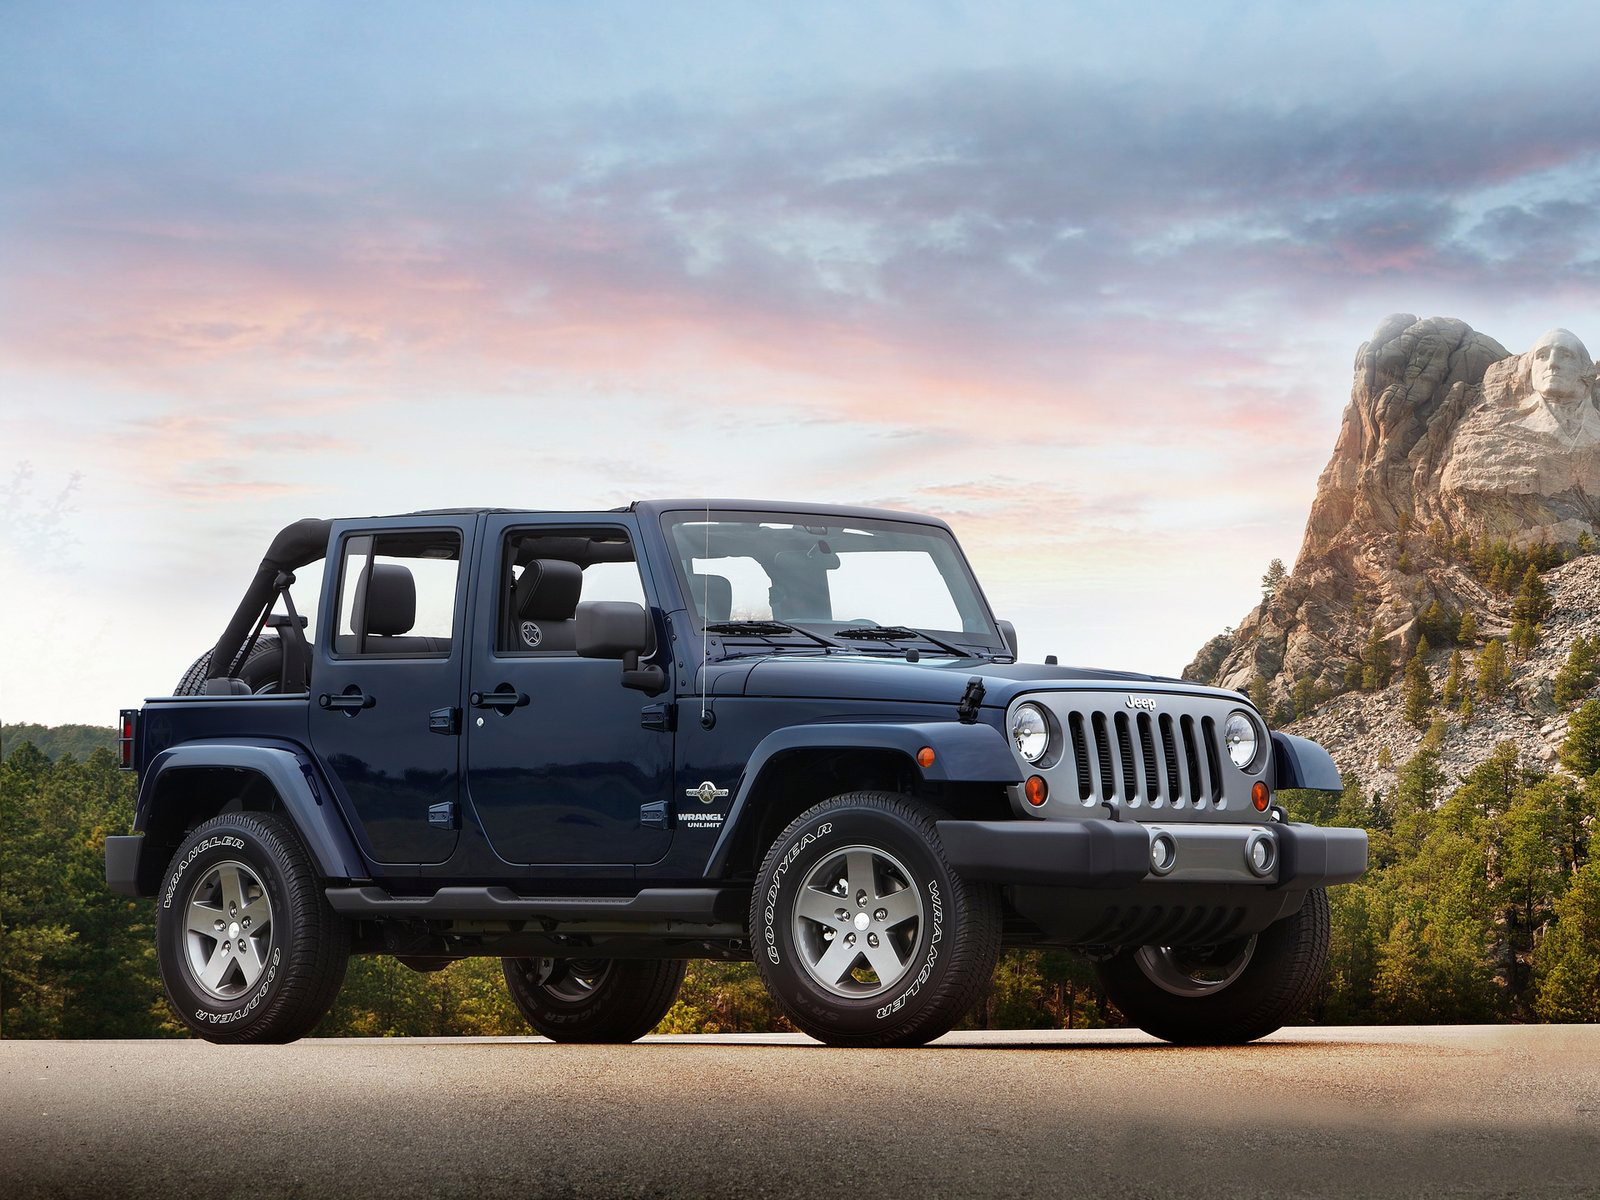 2012 jeep wrangler freedom edition. Black Bedroom Furniture Sets. Home Design Ideas